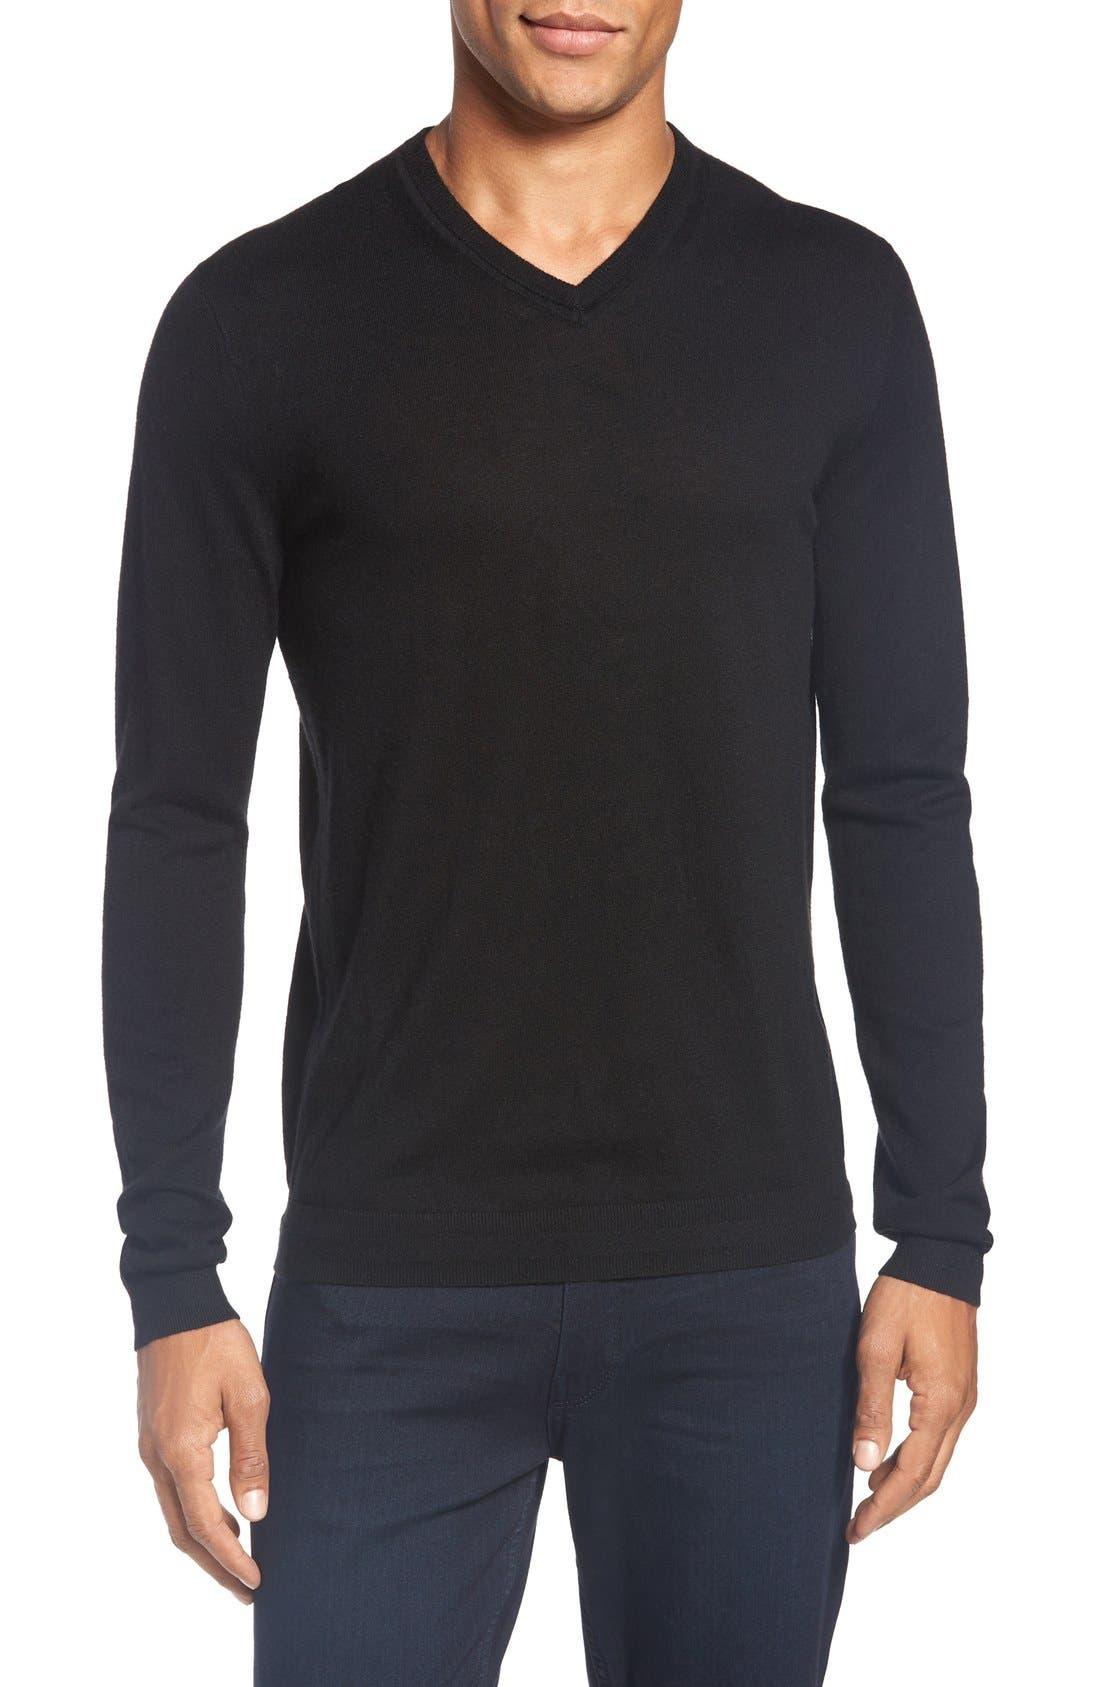 'Cashguy' Trim Fit V-Neck Sweater,                         Main,                         color, 001